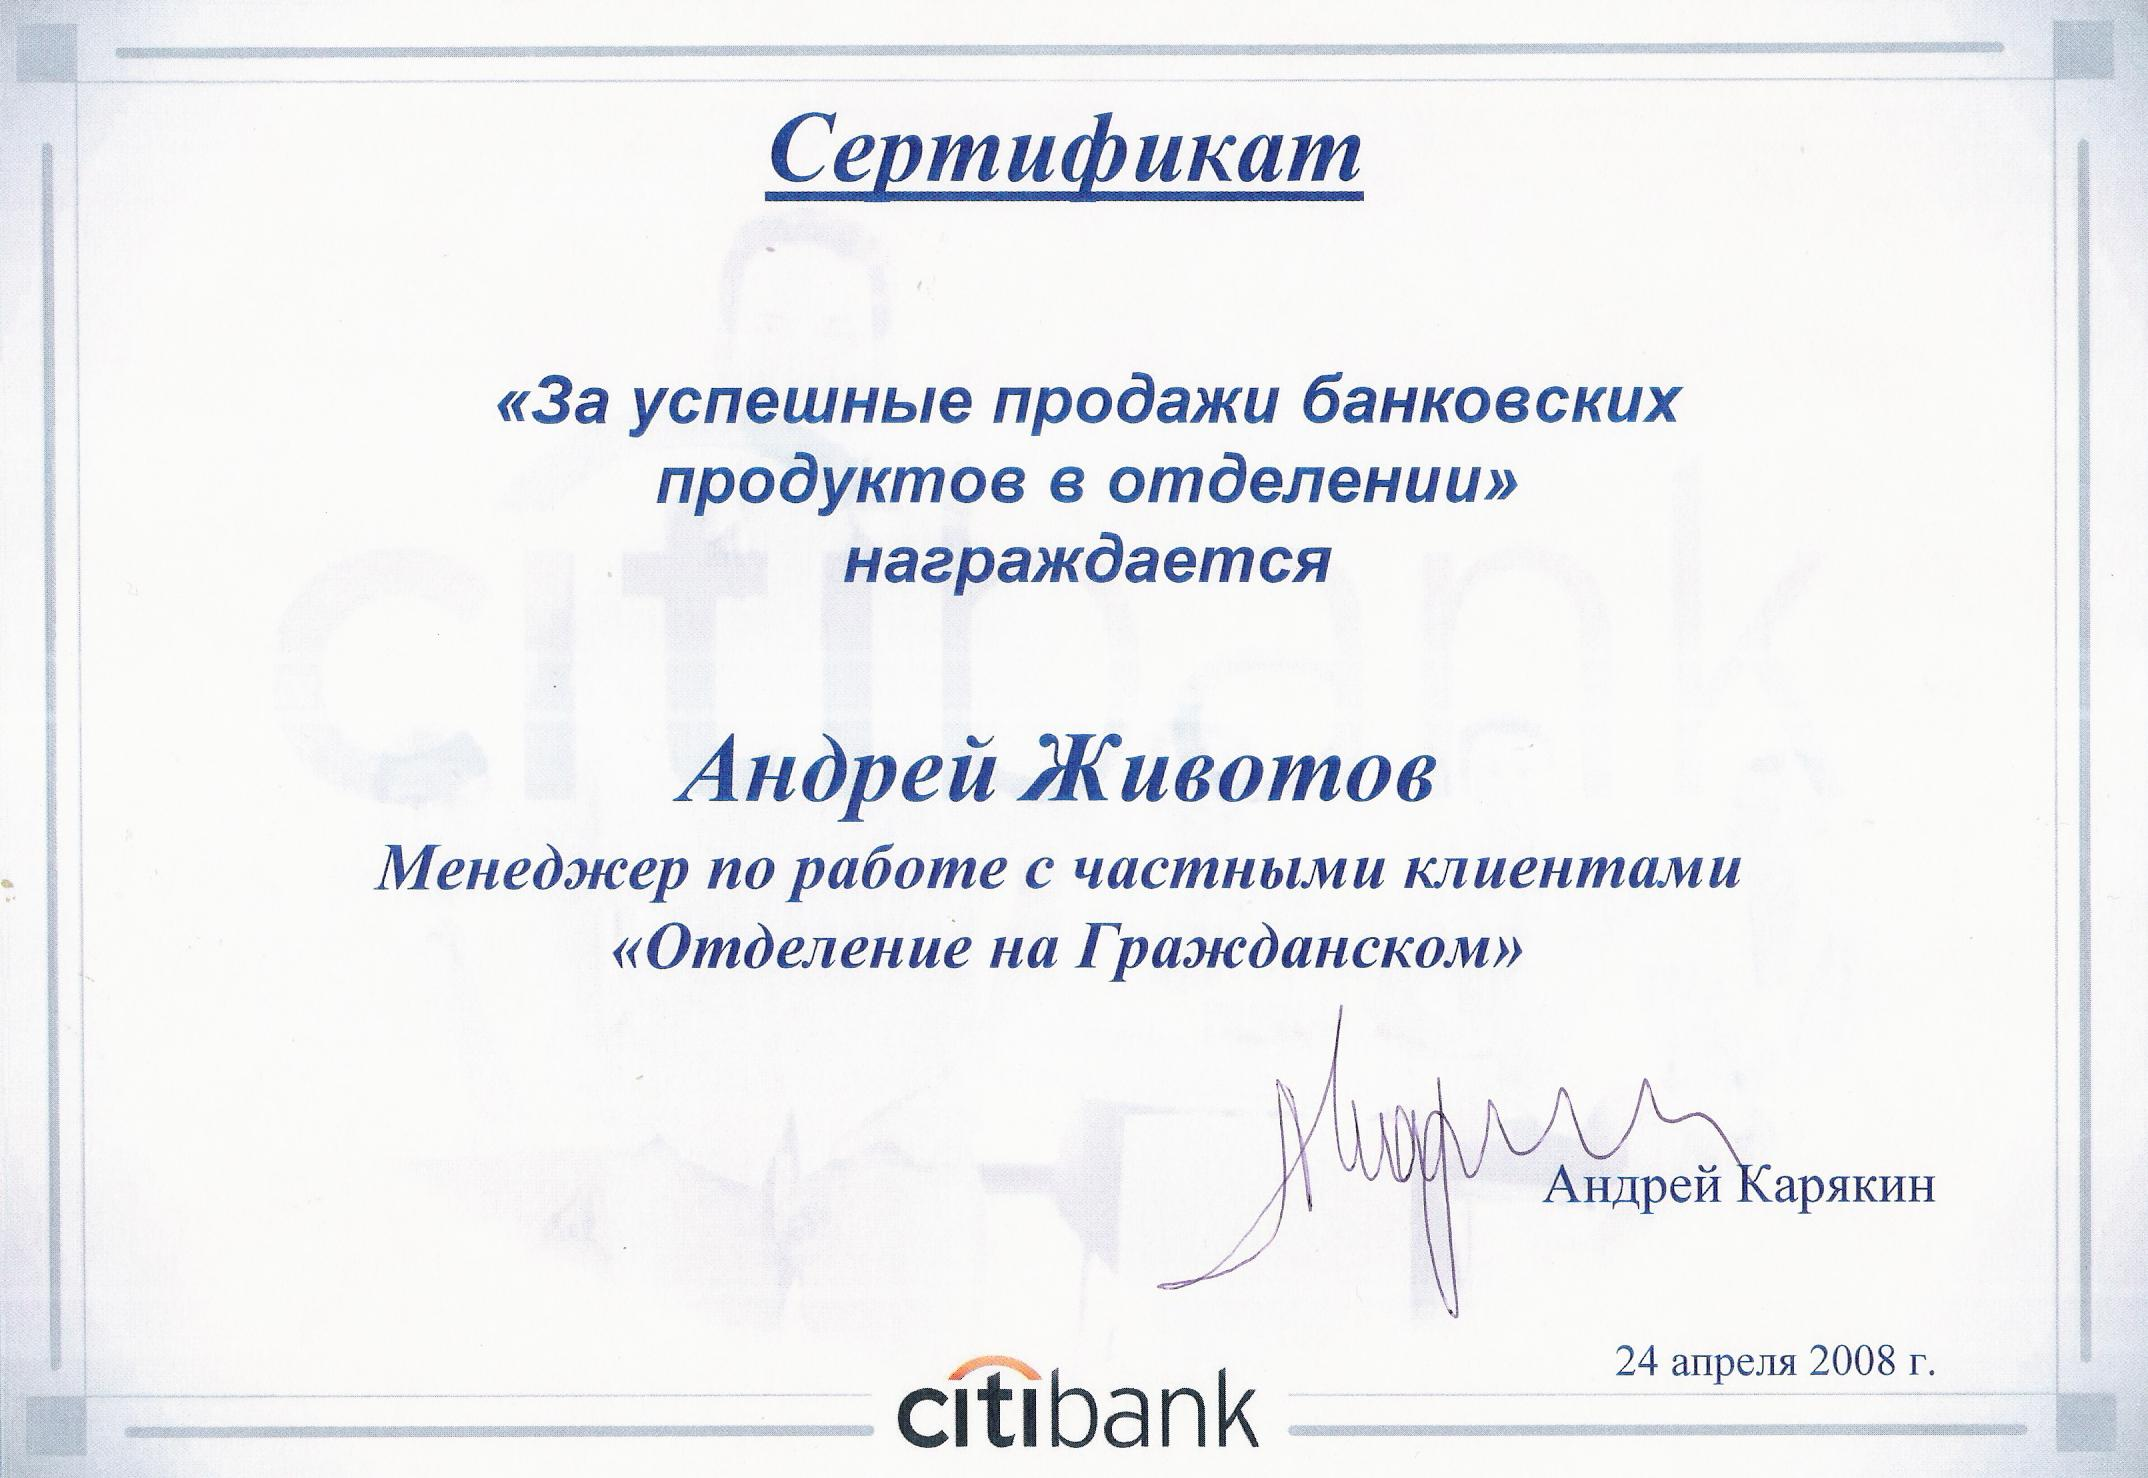 Ситибанк Zhivotov Andrey Karyakin